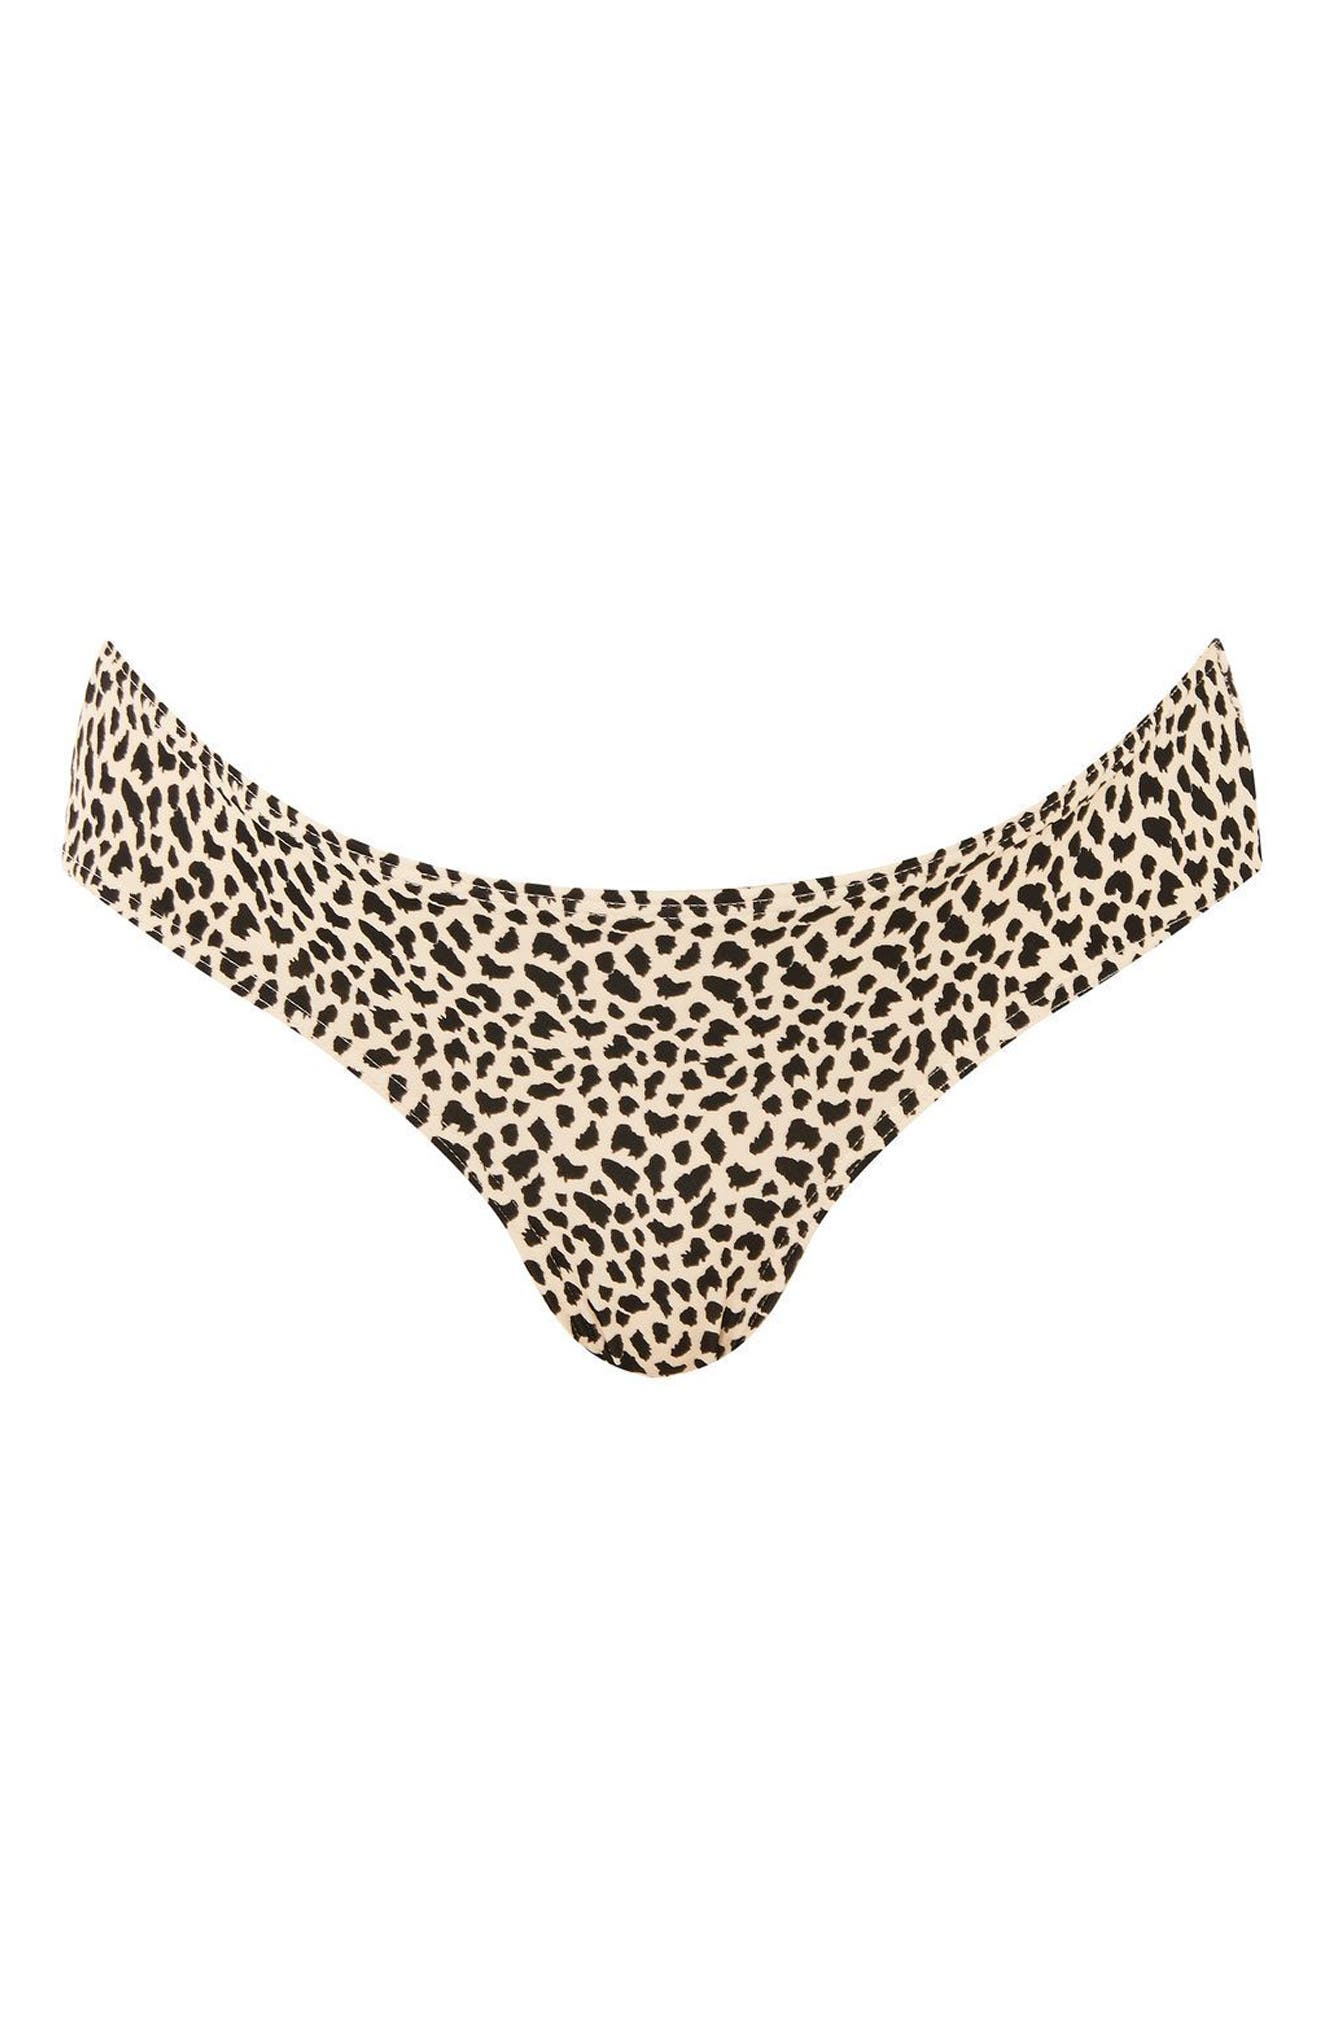 Topshop Leopard Maternity Bikini Bottoms